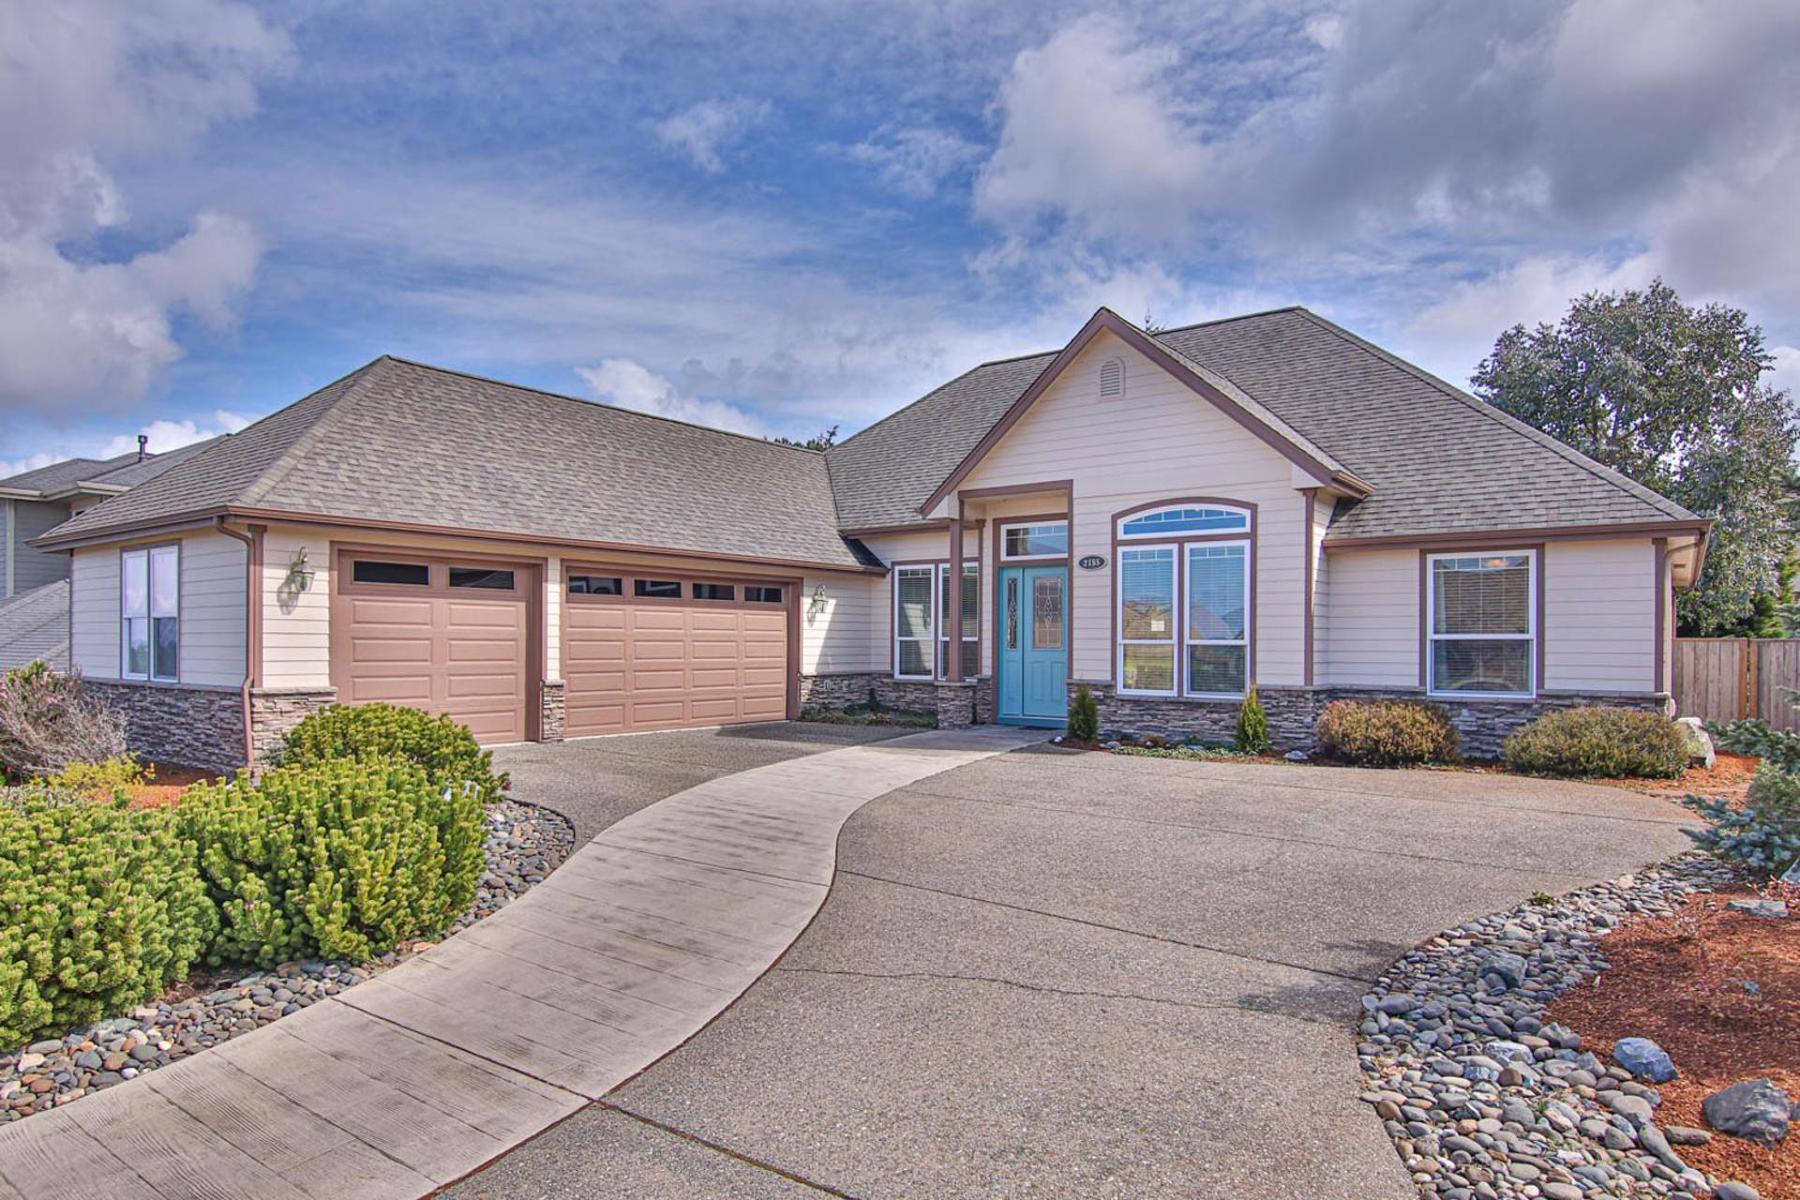 Single Family Homes για την Πώληση στο 2155 Garfield Street, North Bend, OR 97459 North Bend, Ορεγκον 97459 Ηνωμένες Πολιτείες